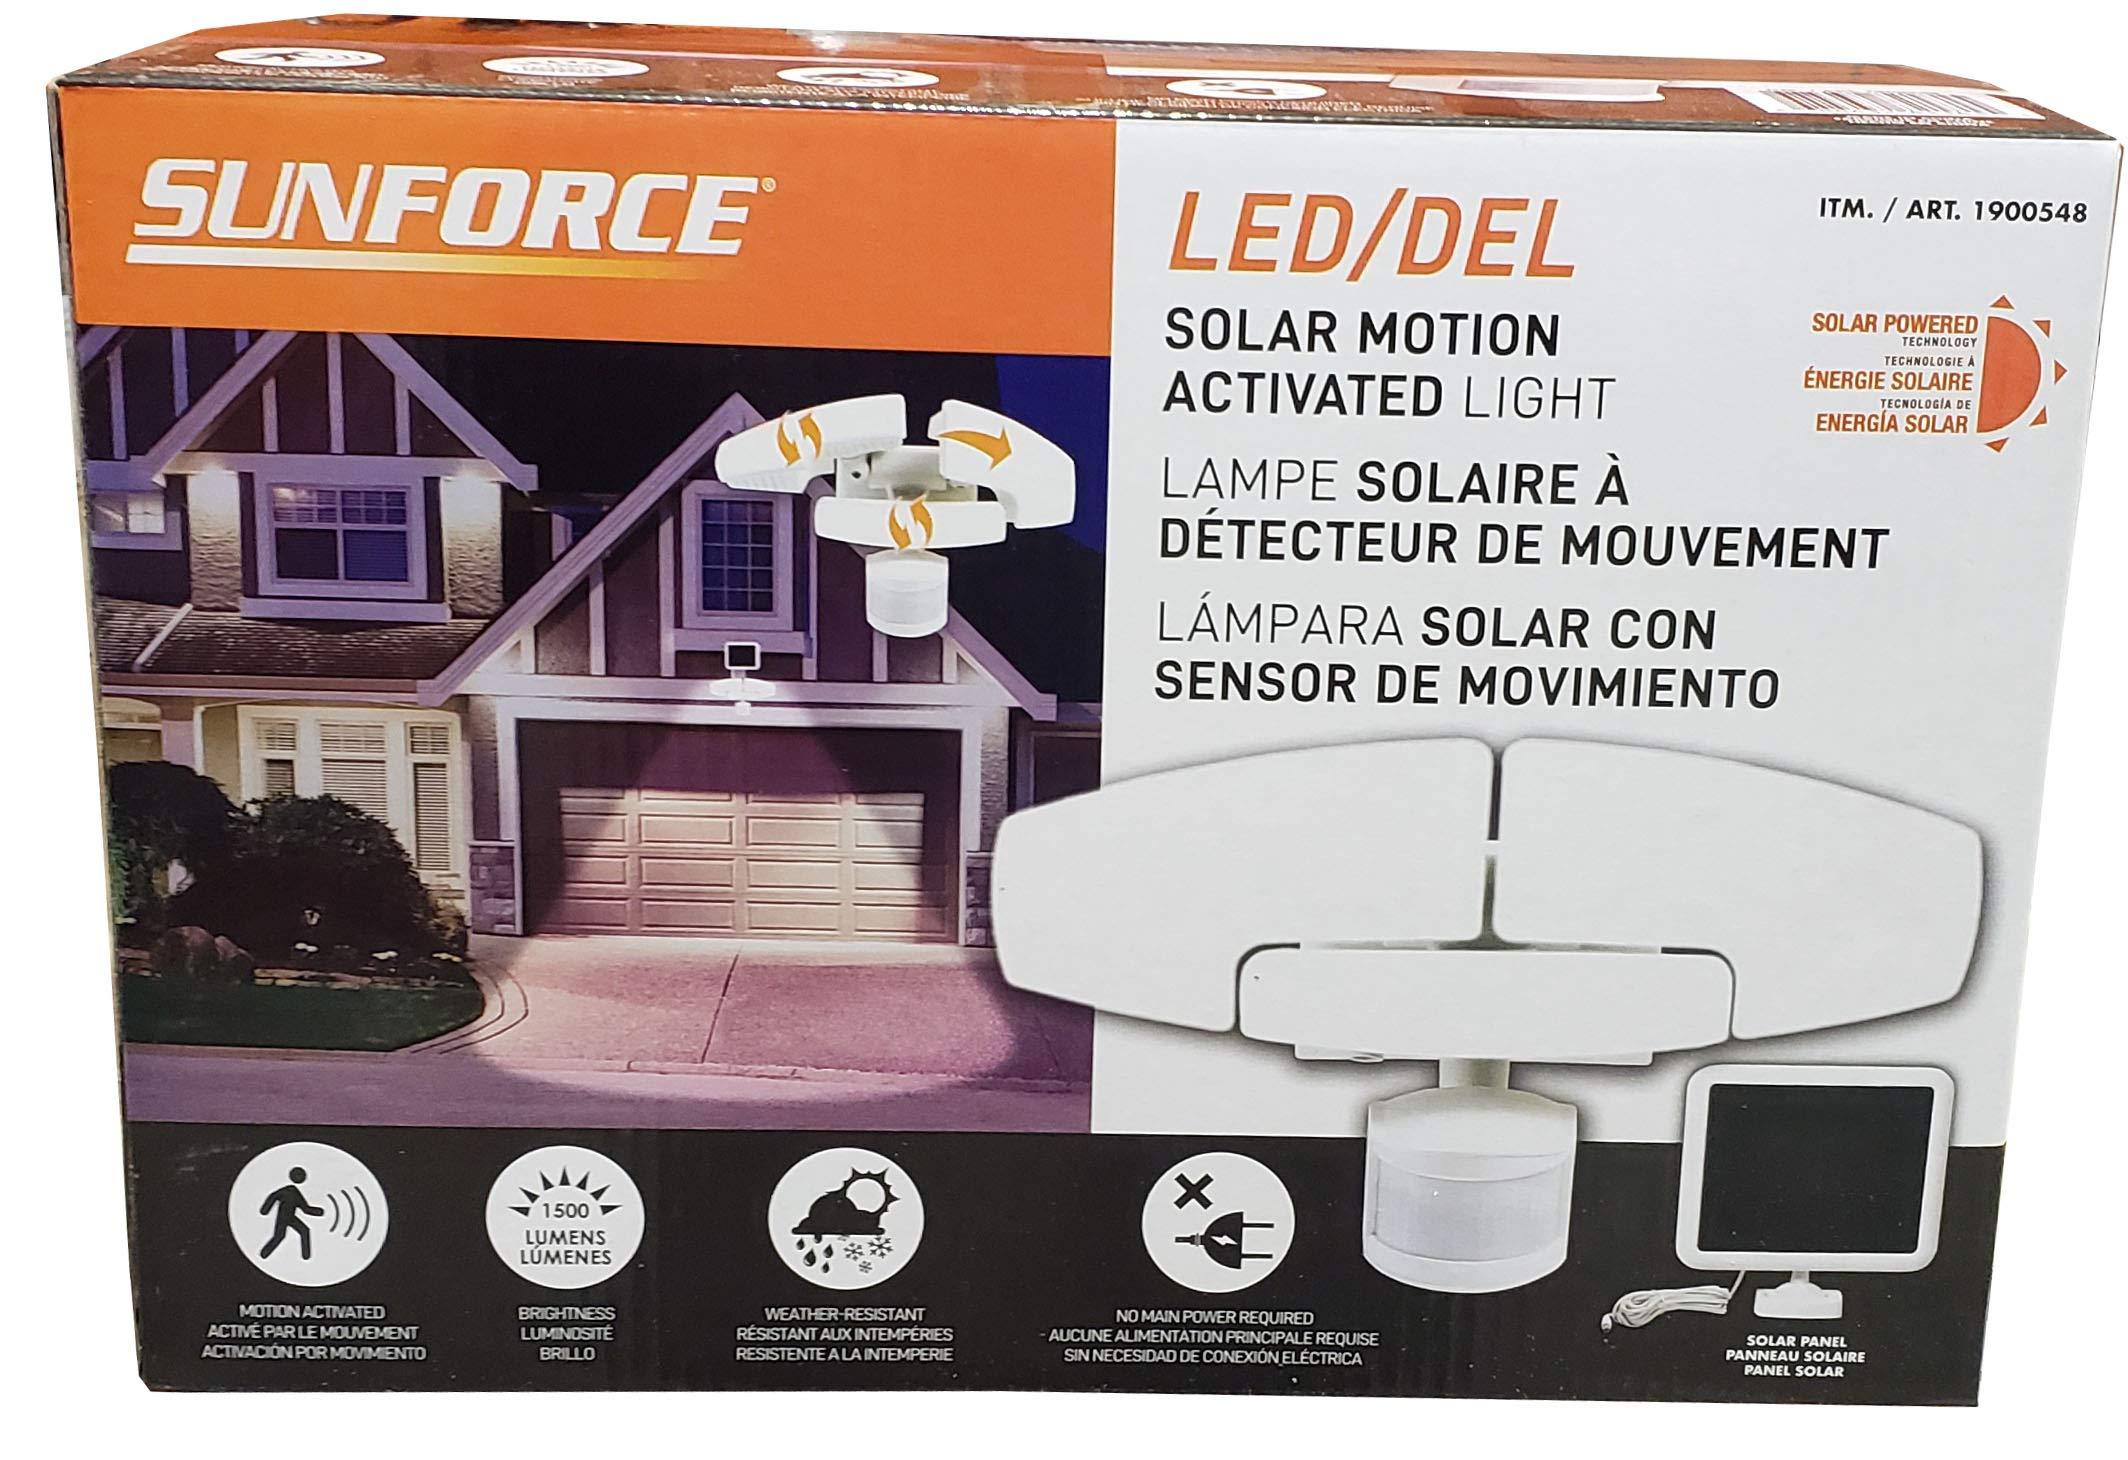 Sunforce Solar Motion Security Light Led/Del, Orange by Sunforce